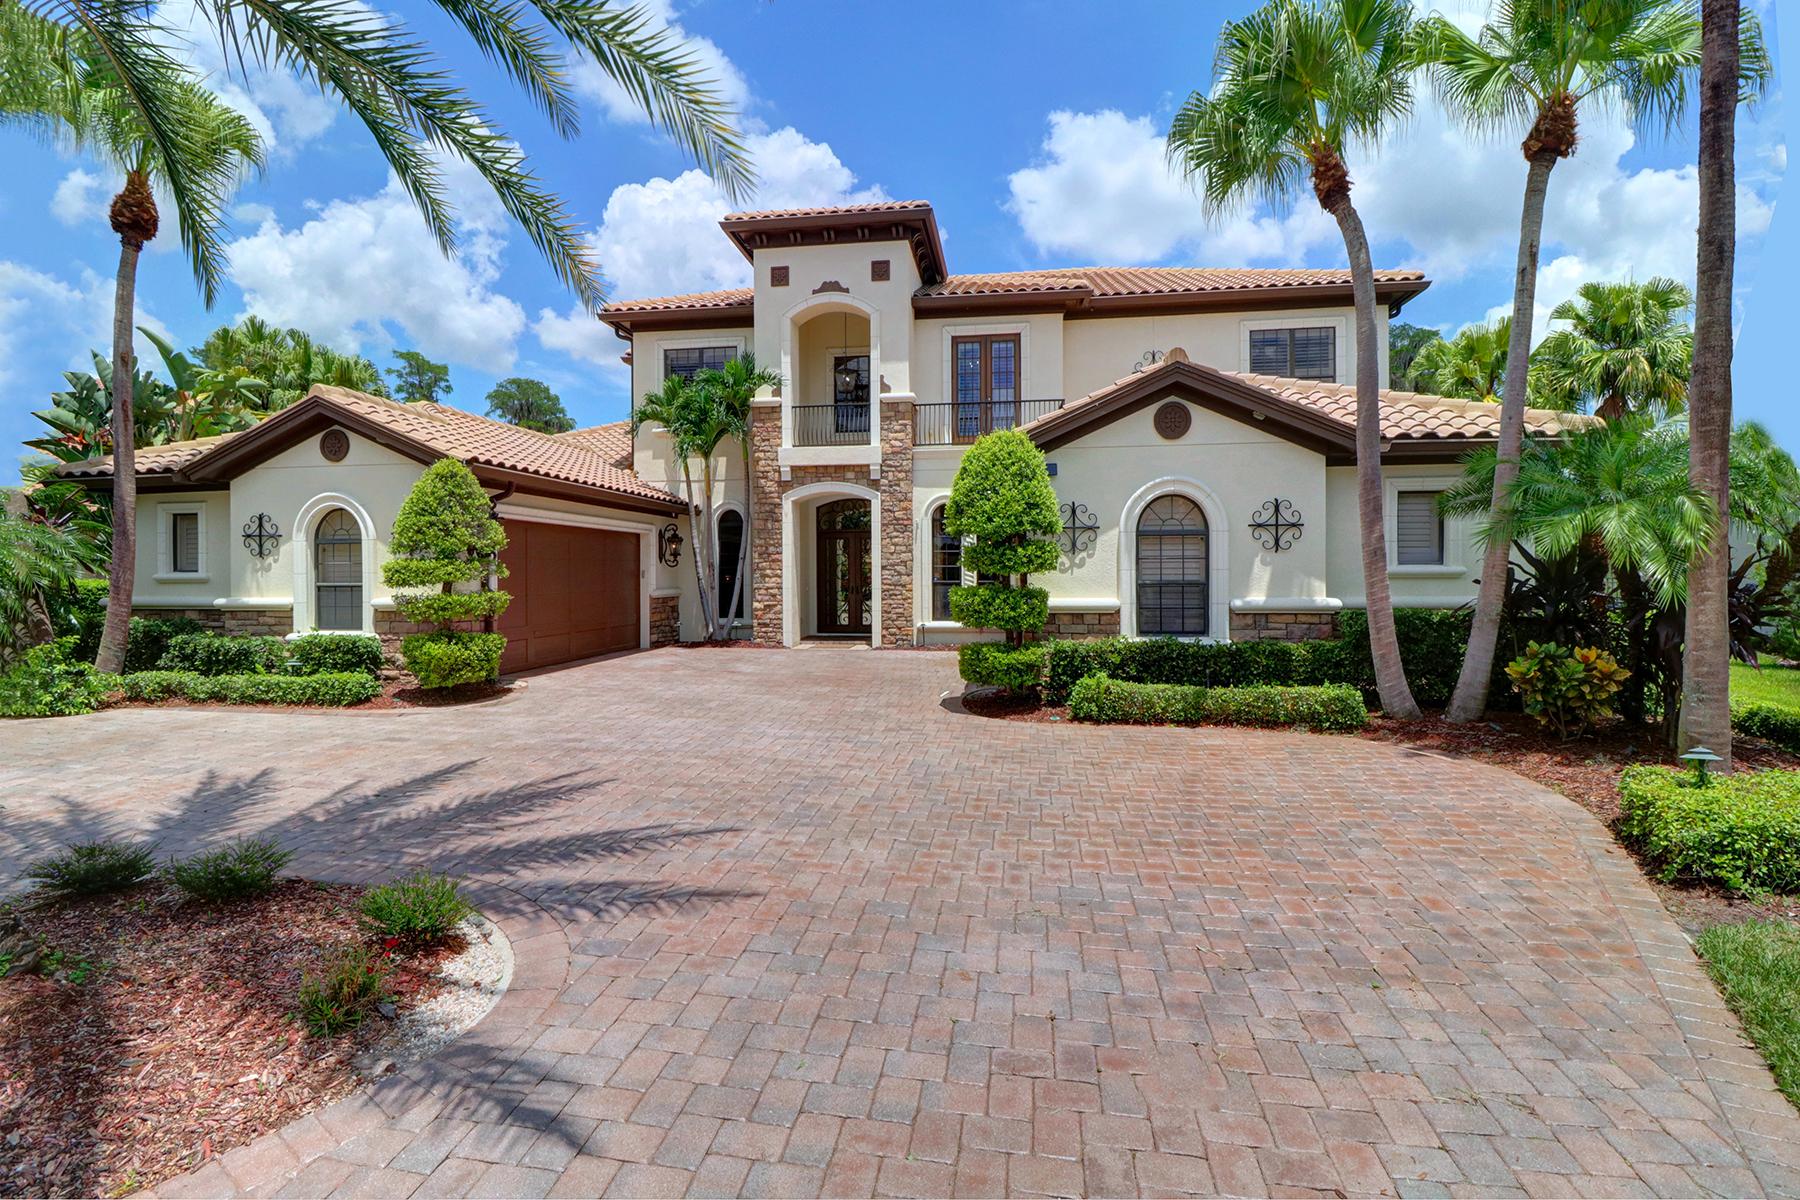 Single Family Homes için Satış at LUTZ 17301 Ladera Estates Blvd, Lutz, Florida 33548 Amerika Birleşik Devletleri